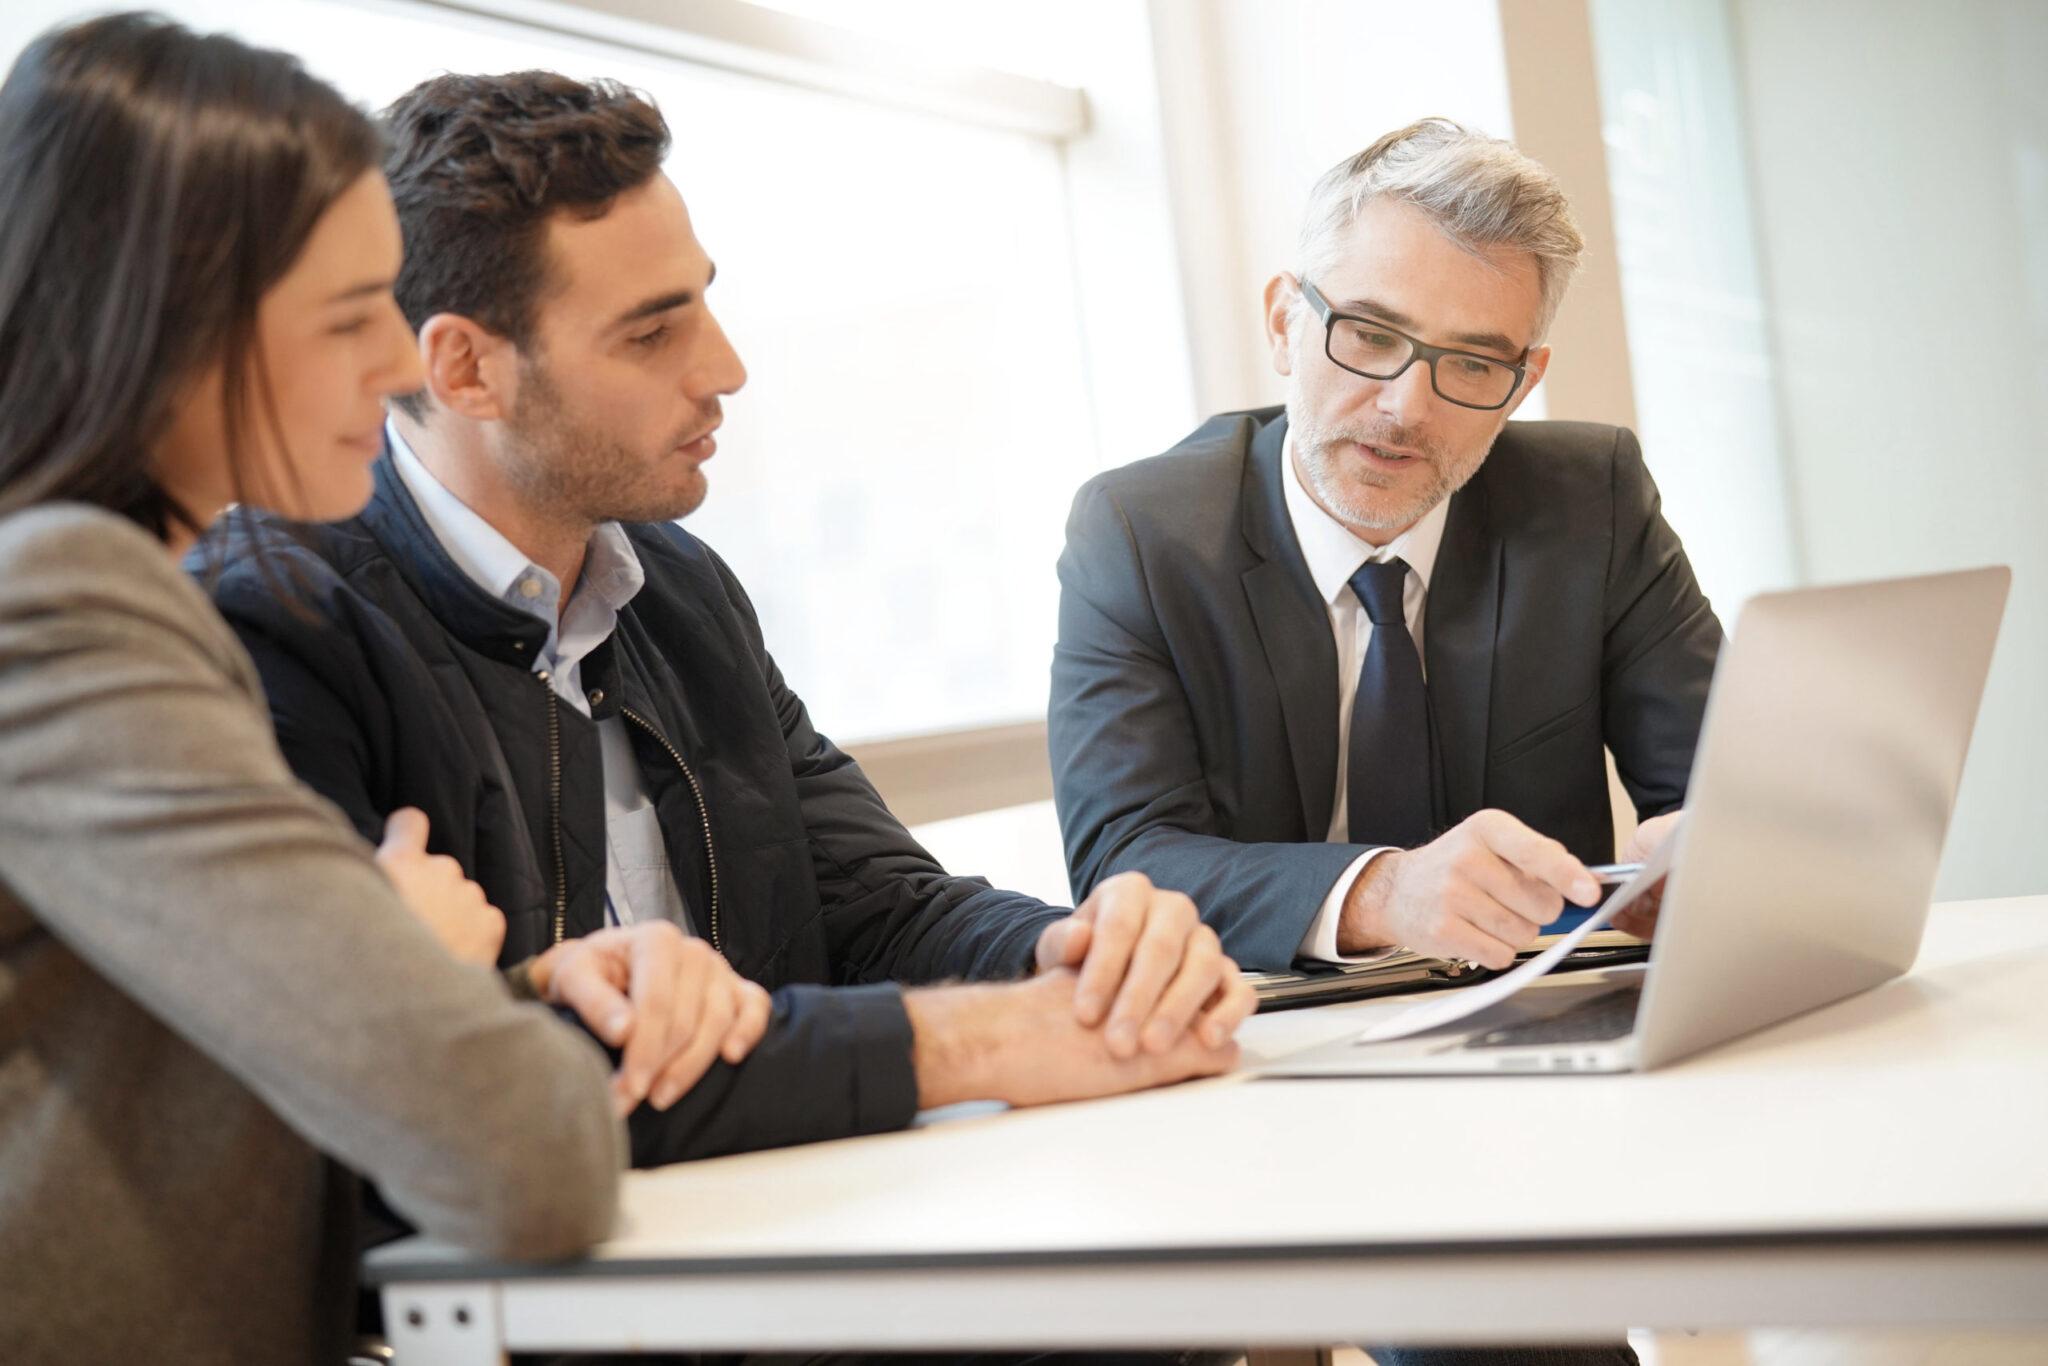 Southampton Mortgage Advisors